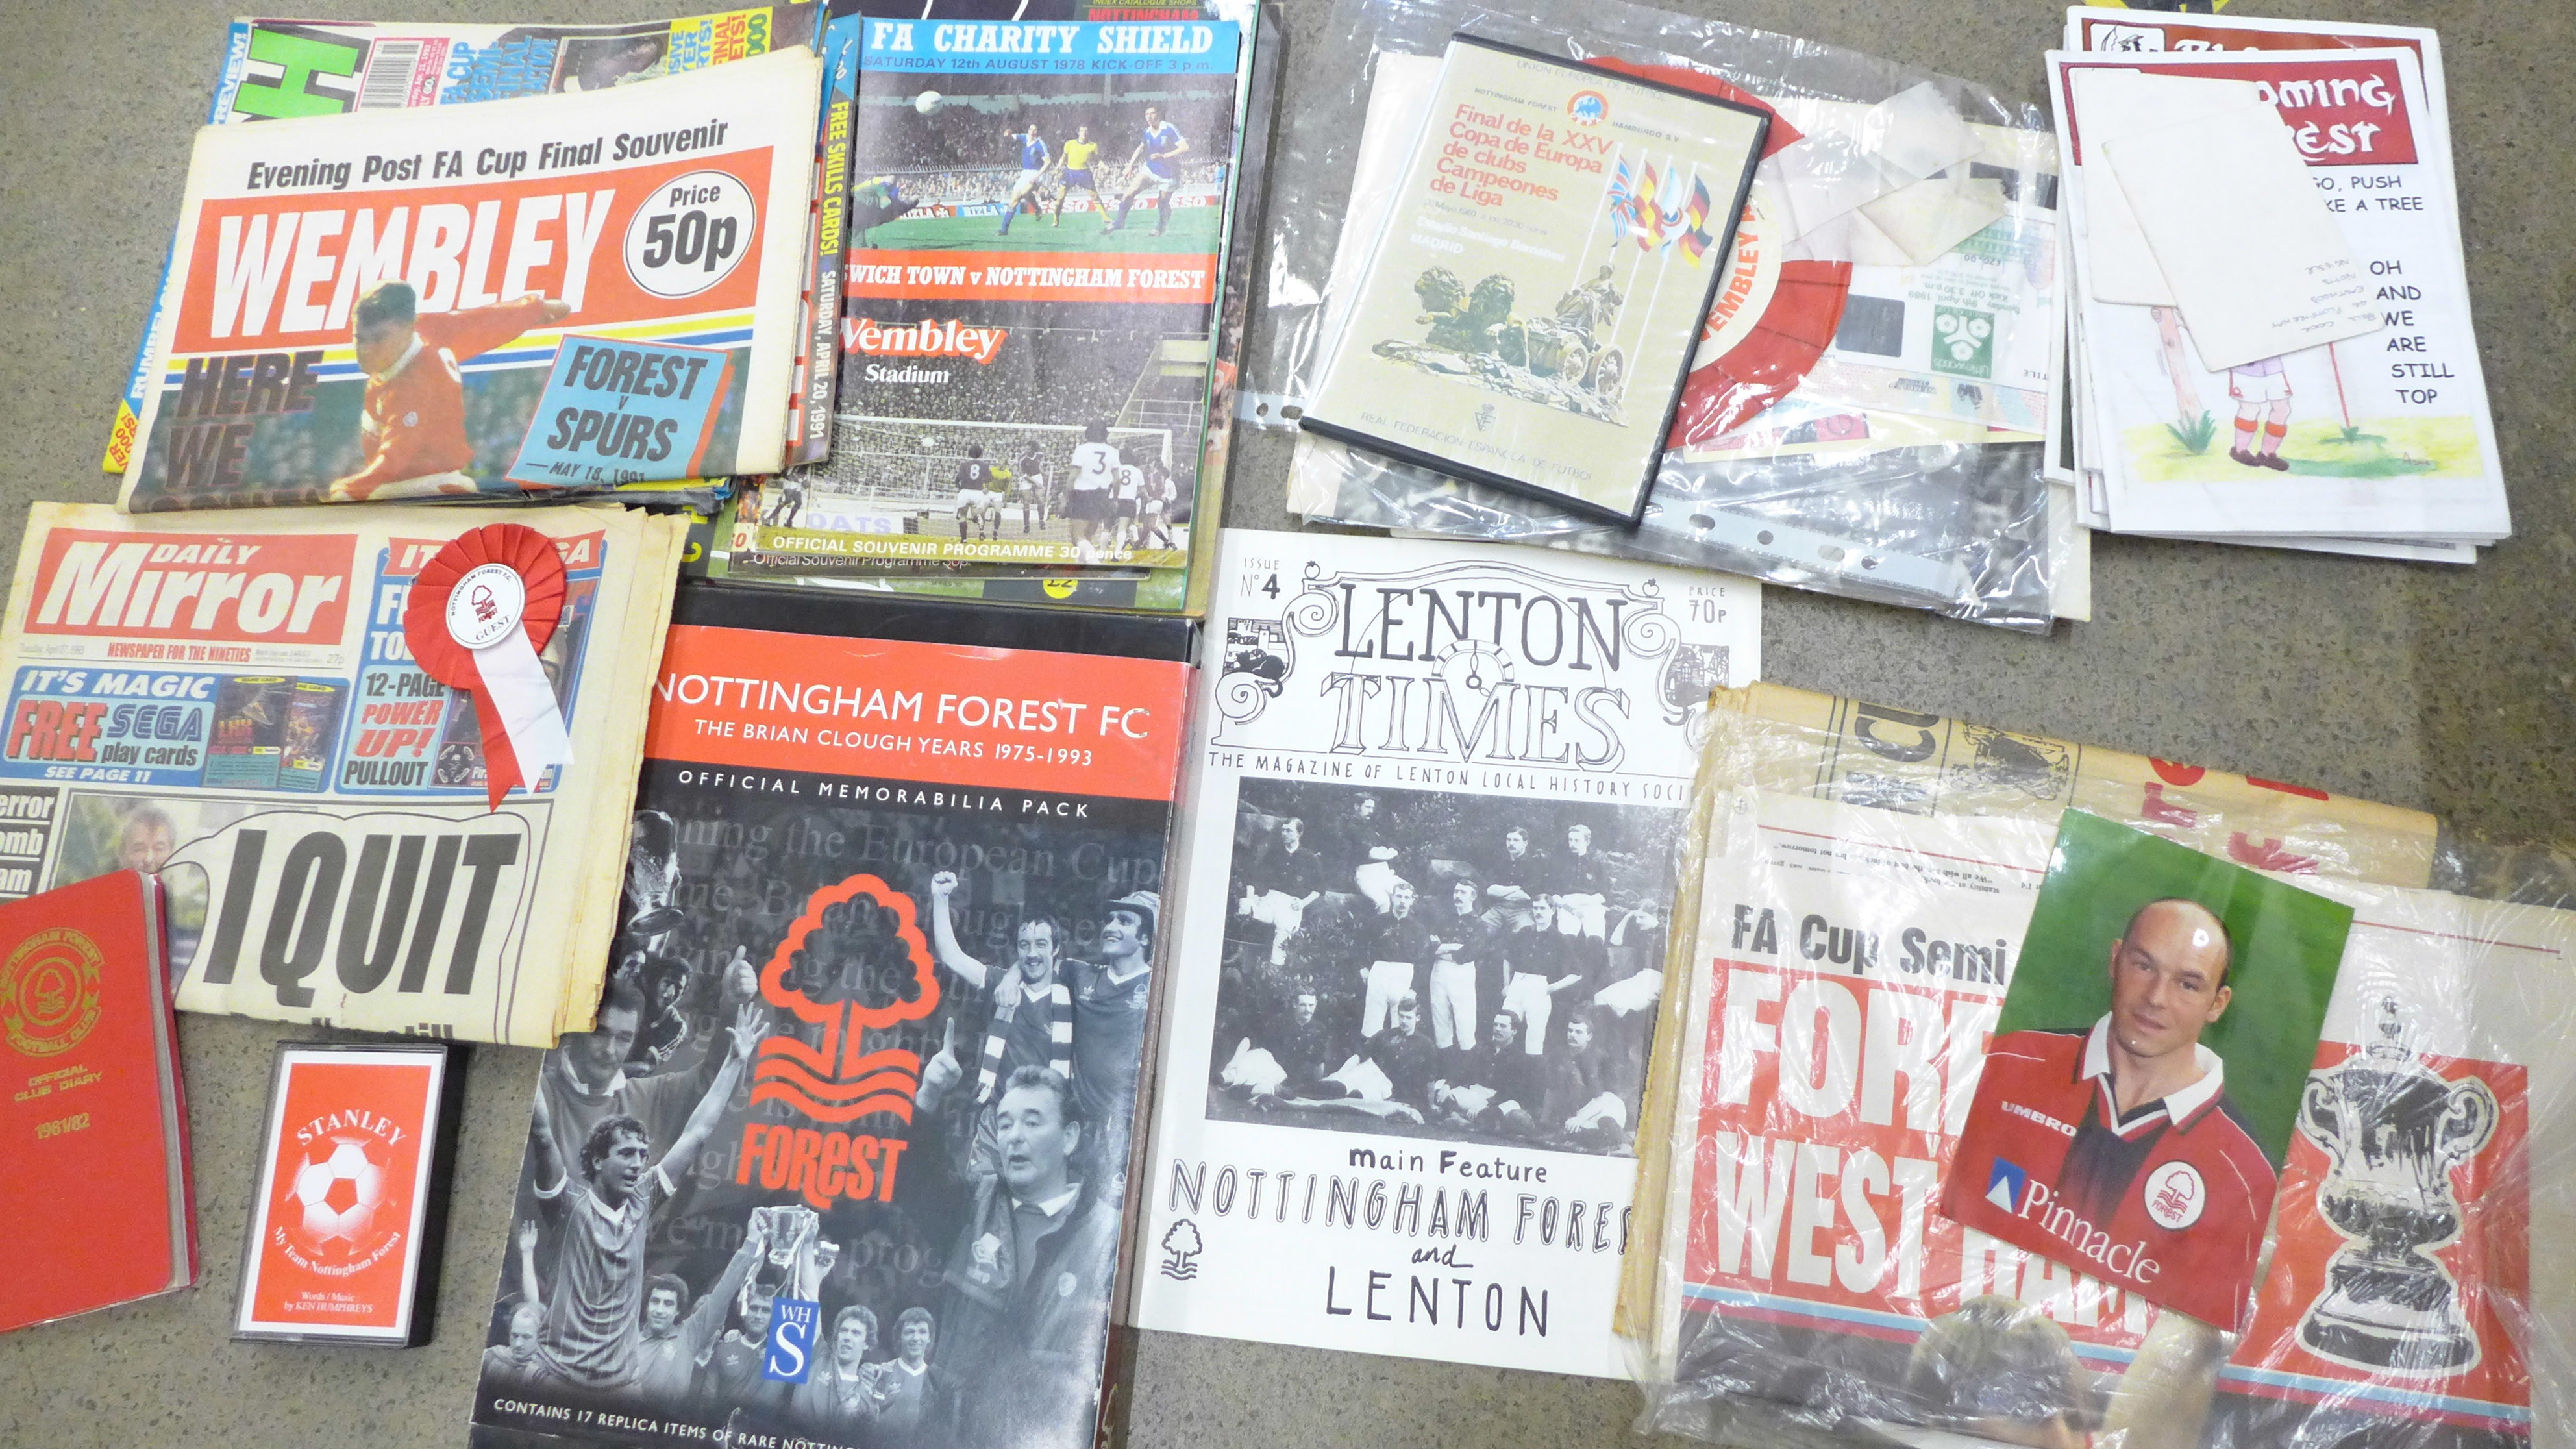 Football programmes including Nottingham Forest and other Nottingham Forest ephemera